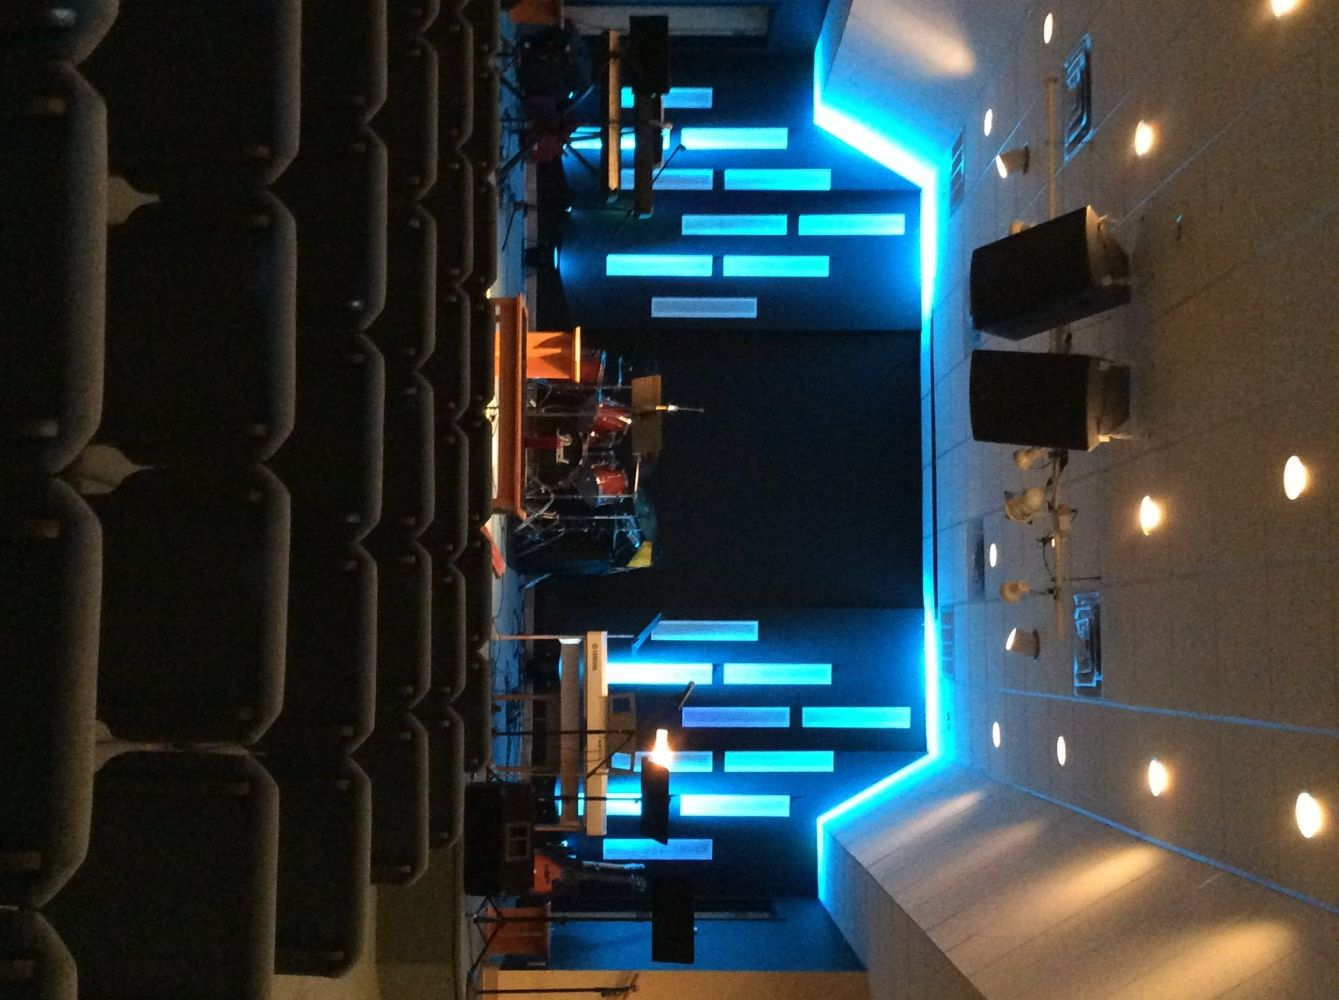 Vert Gutters Church Stage Design Ideas Church Stage Design Church Stage Church Design